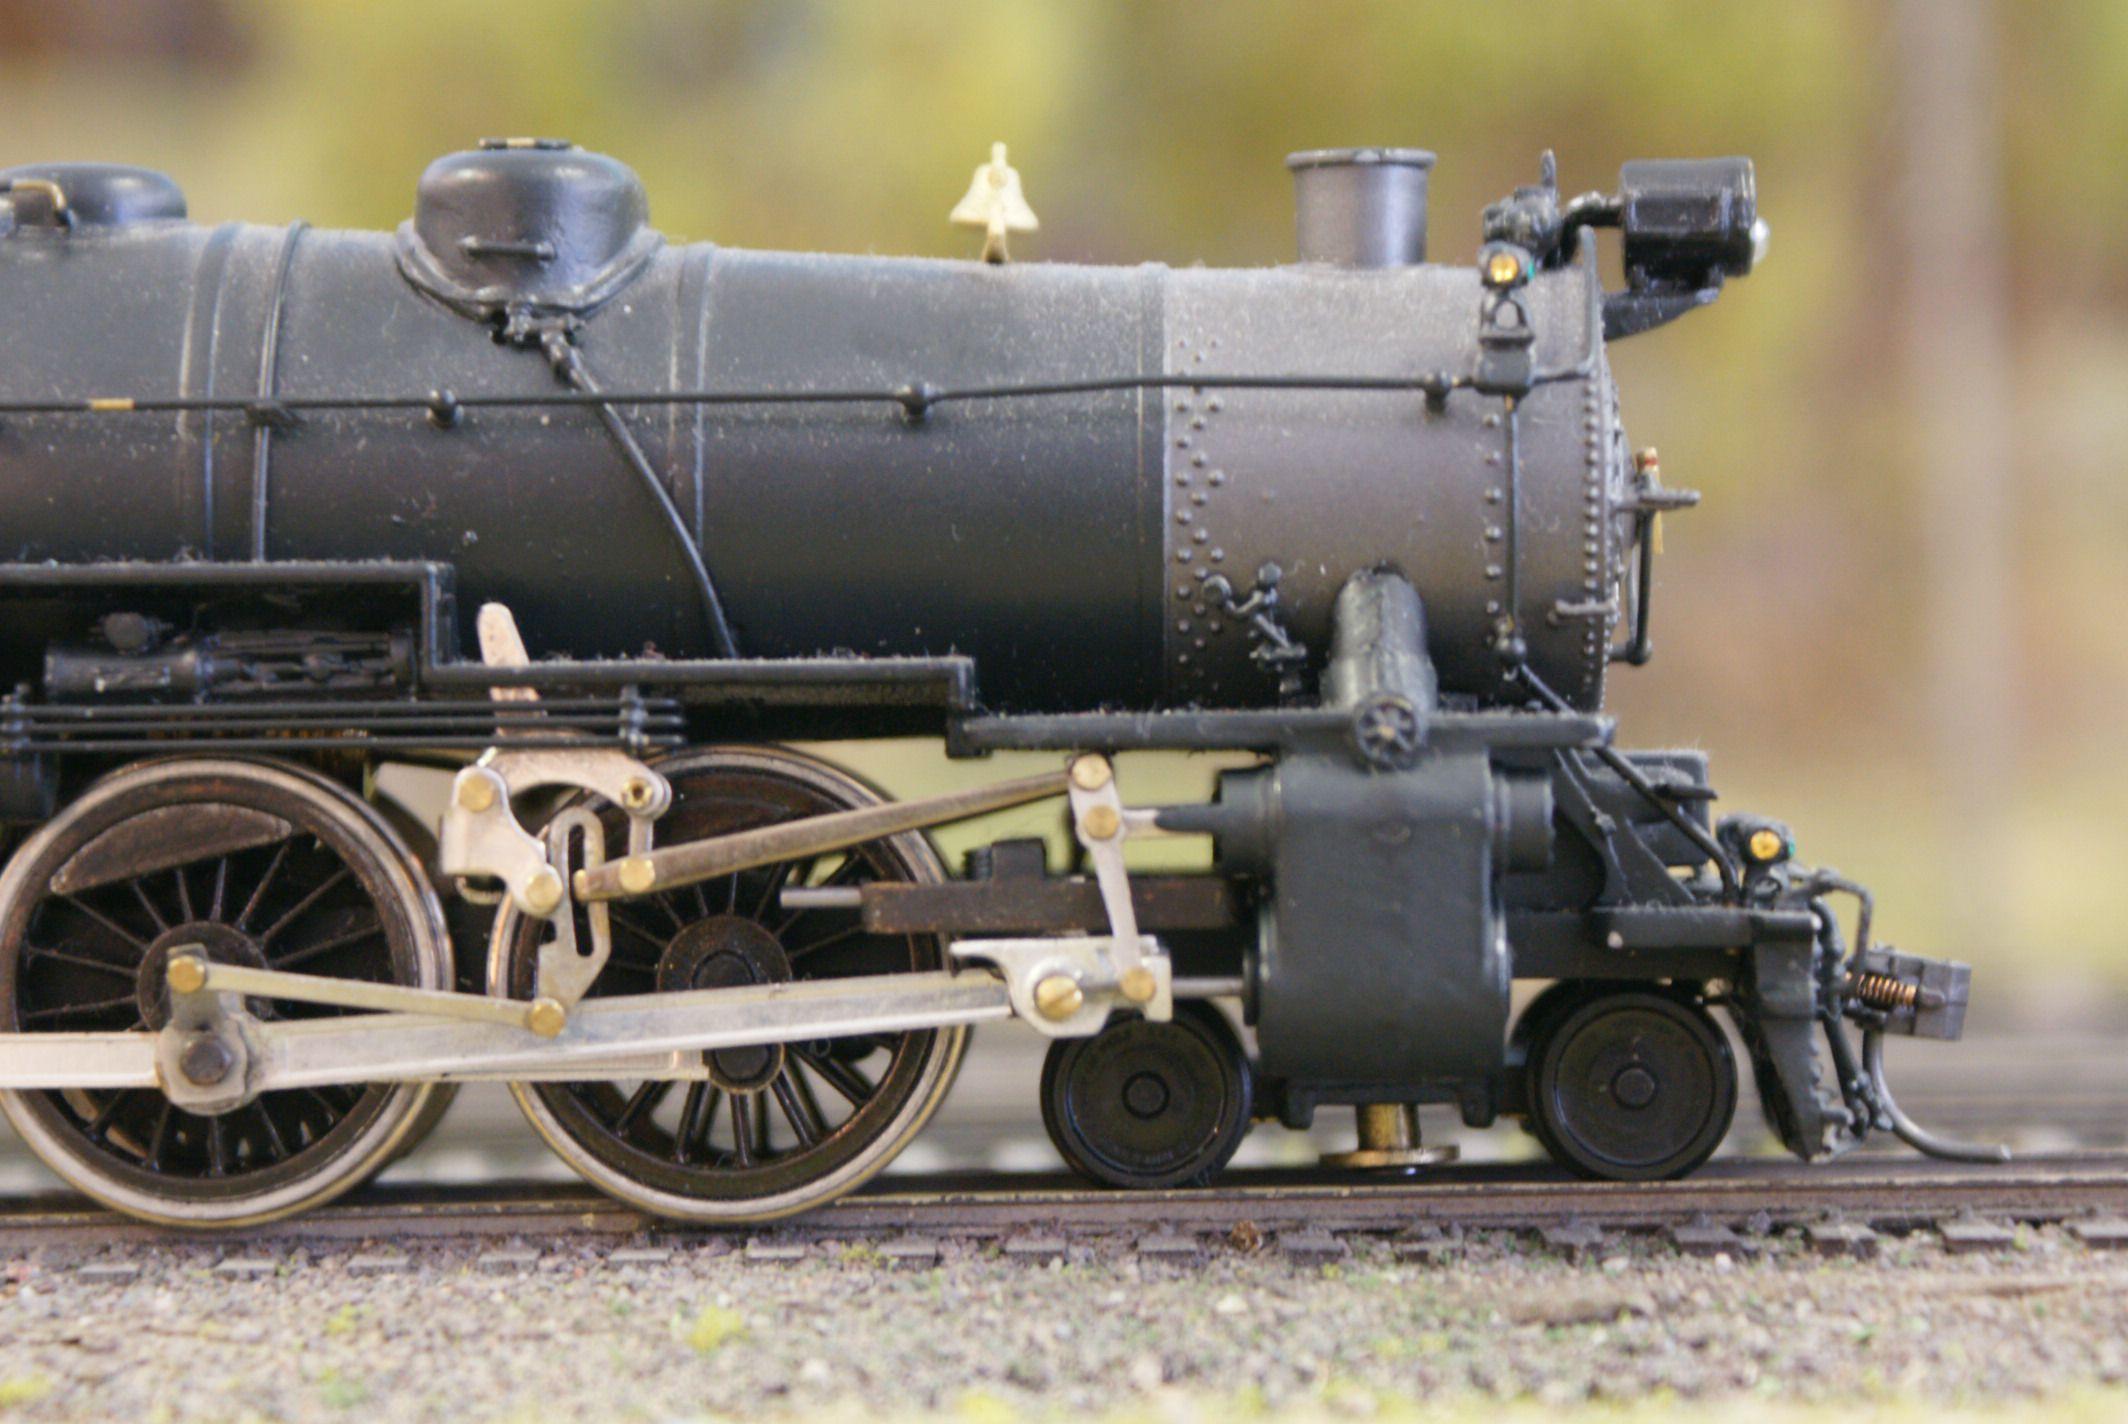 train seats, train engine diagrams, train suspension, train parts, train horn diagrams, train drawings, train battery, on marx train wiring diagrams